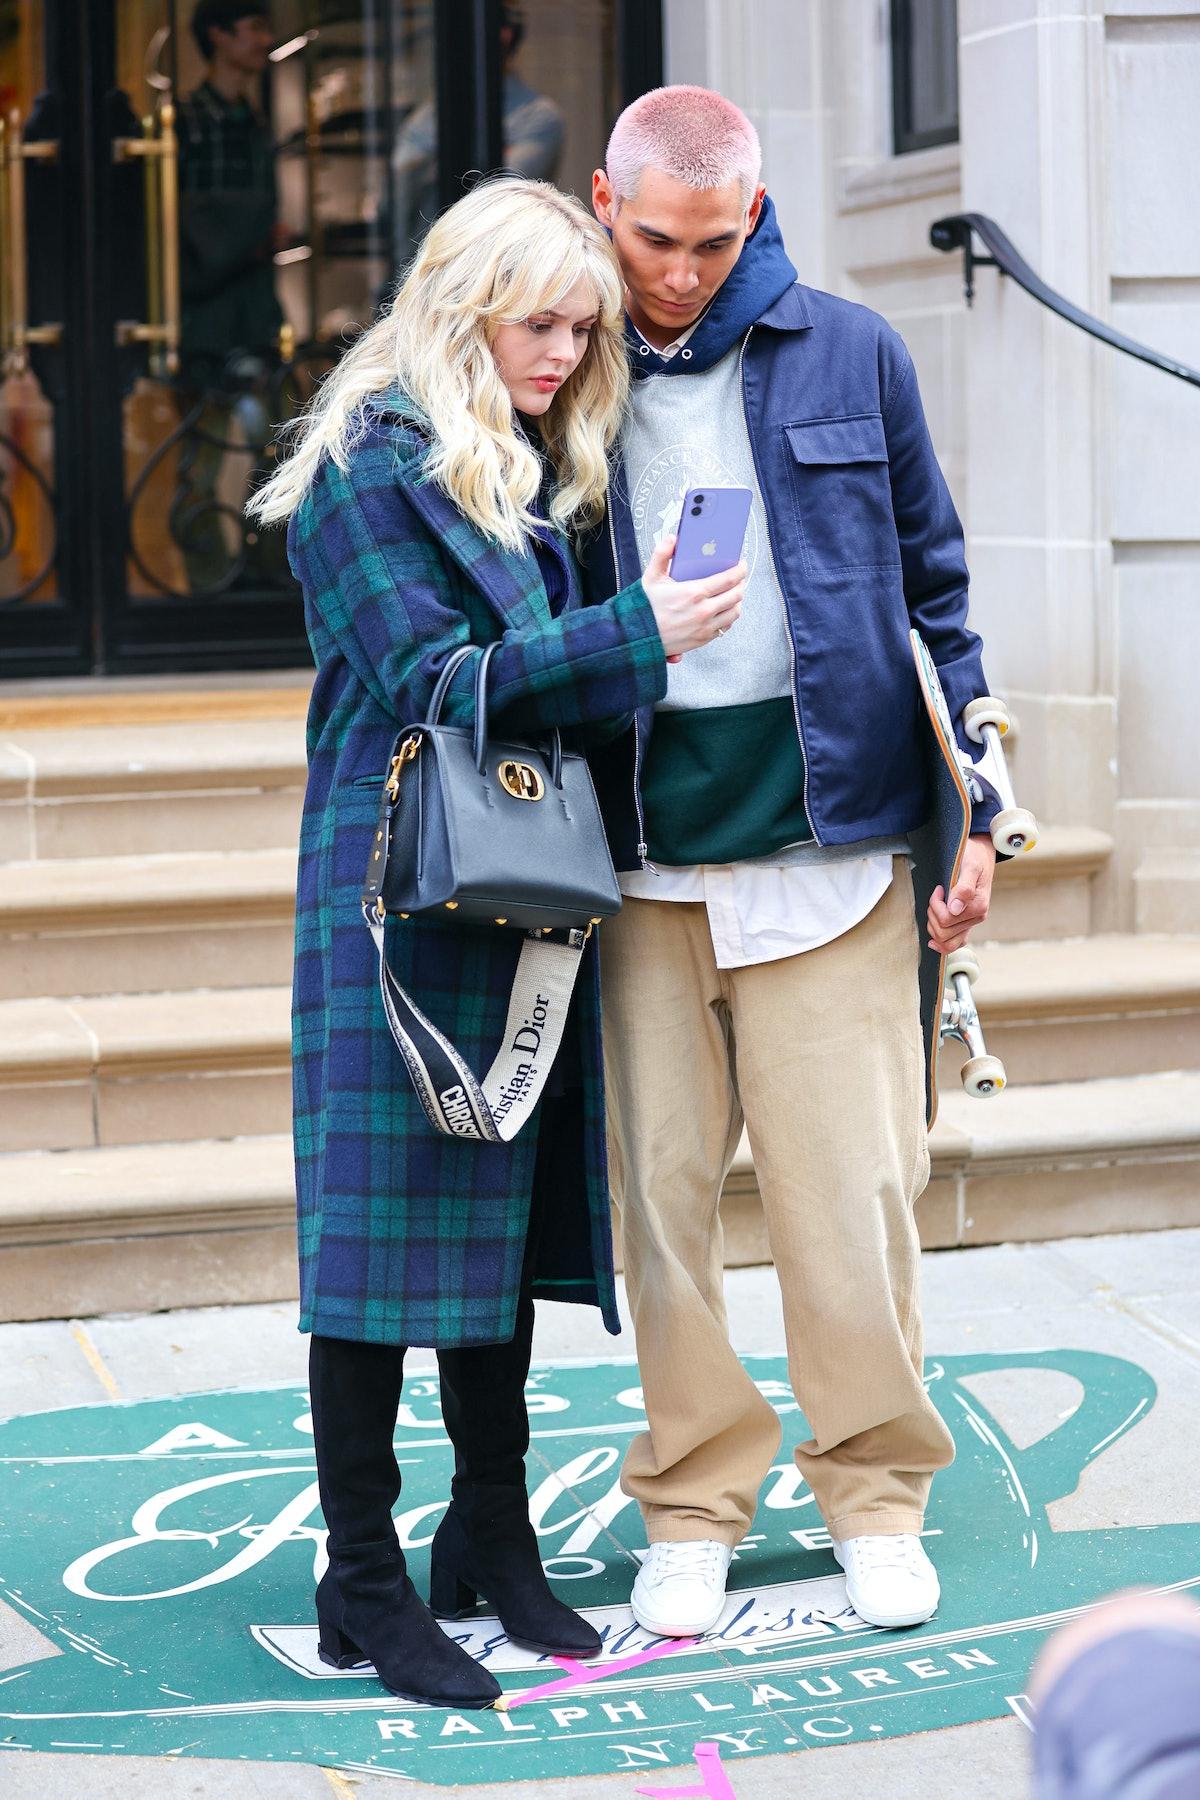 Emily Alyn Lind and Evan Mock on the set of the Gossip Girl reboot